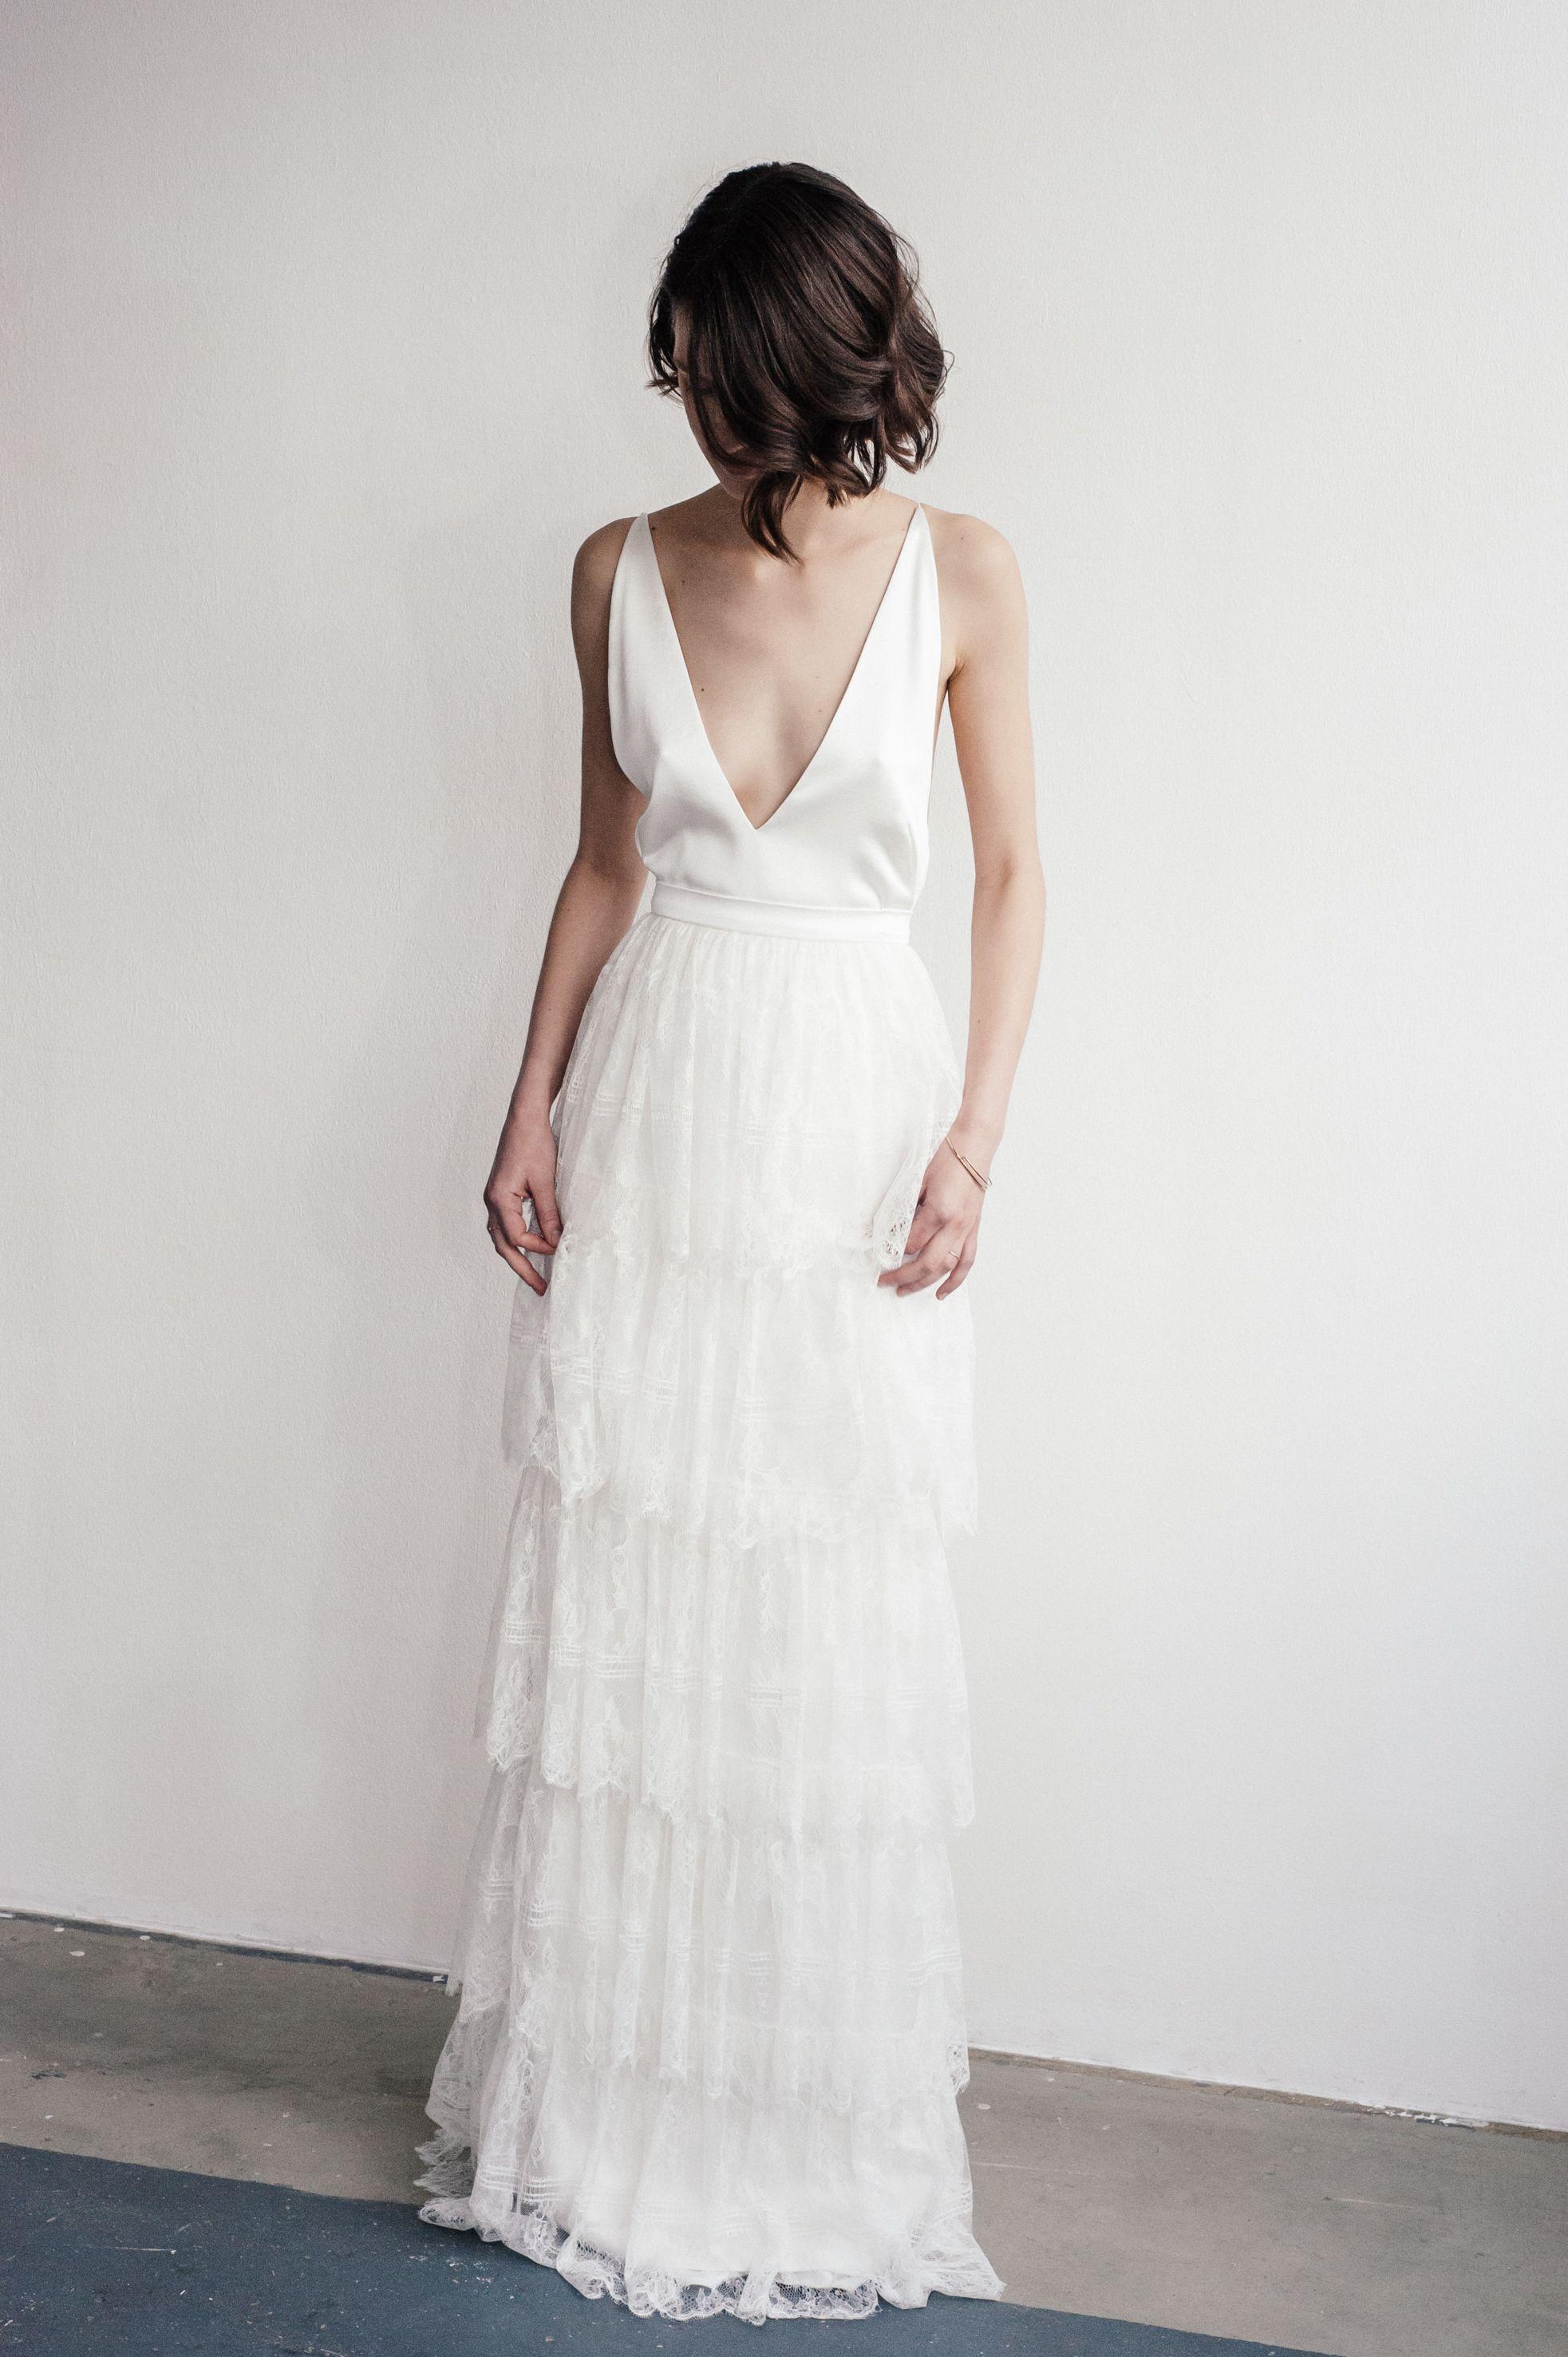 Lilly Ingenhoven Bridal - Dieses bodenlange, elegante Brautkleid